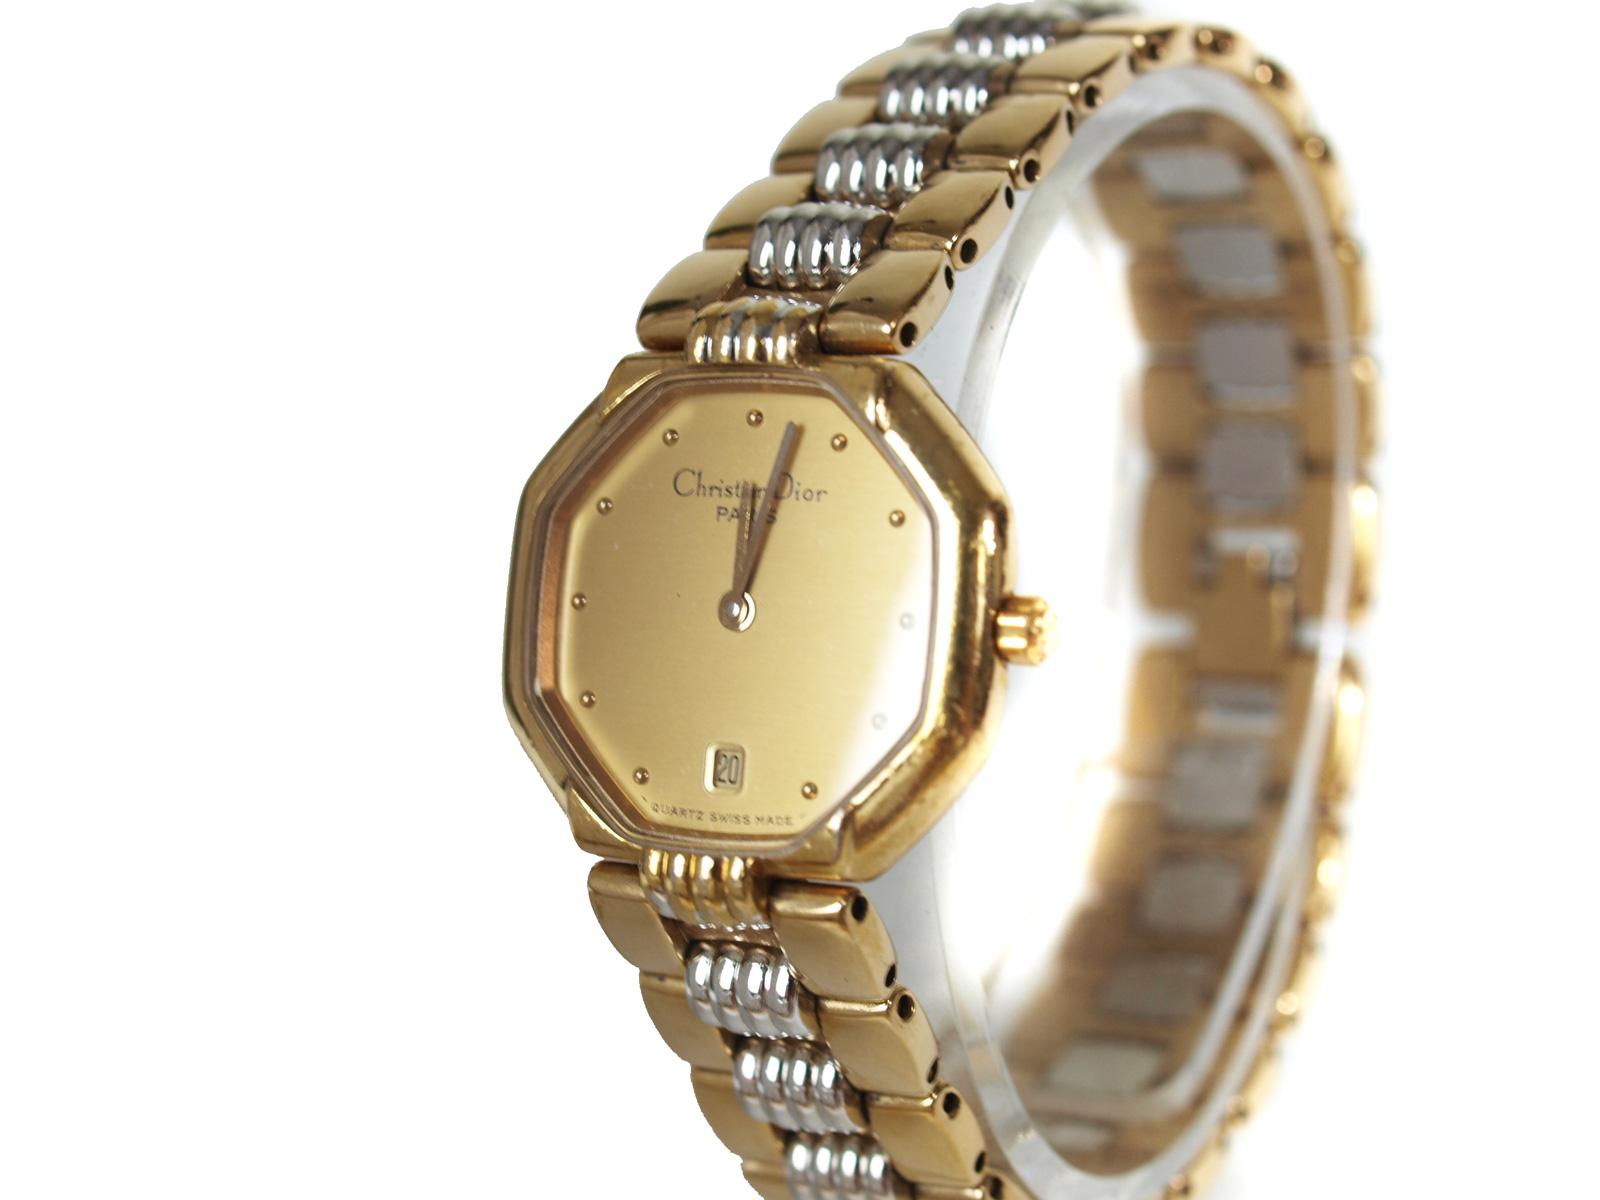 -Christian Dior- ディオール スイングウォッチ【48.122】【レディース】【ゴールド・シルバ】【中古】